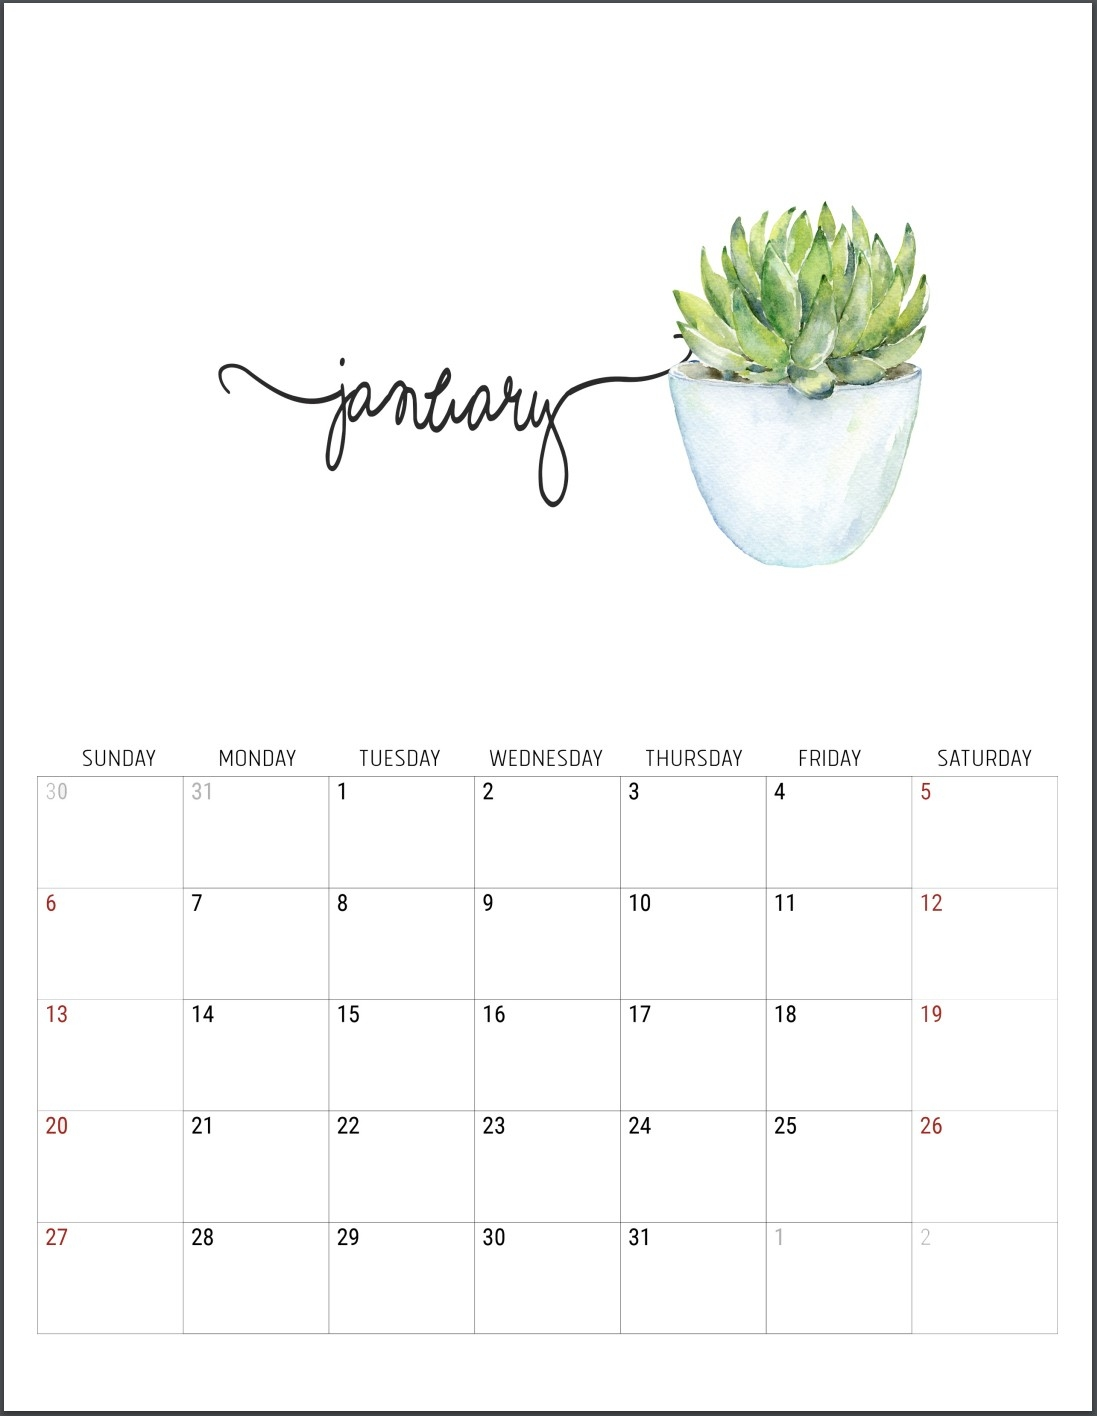 2019 Free Printable Calendars - Lolly Jane-Beach Calendar With Blanks